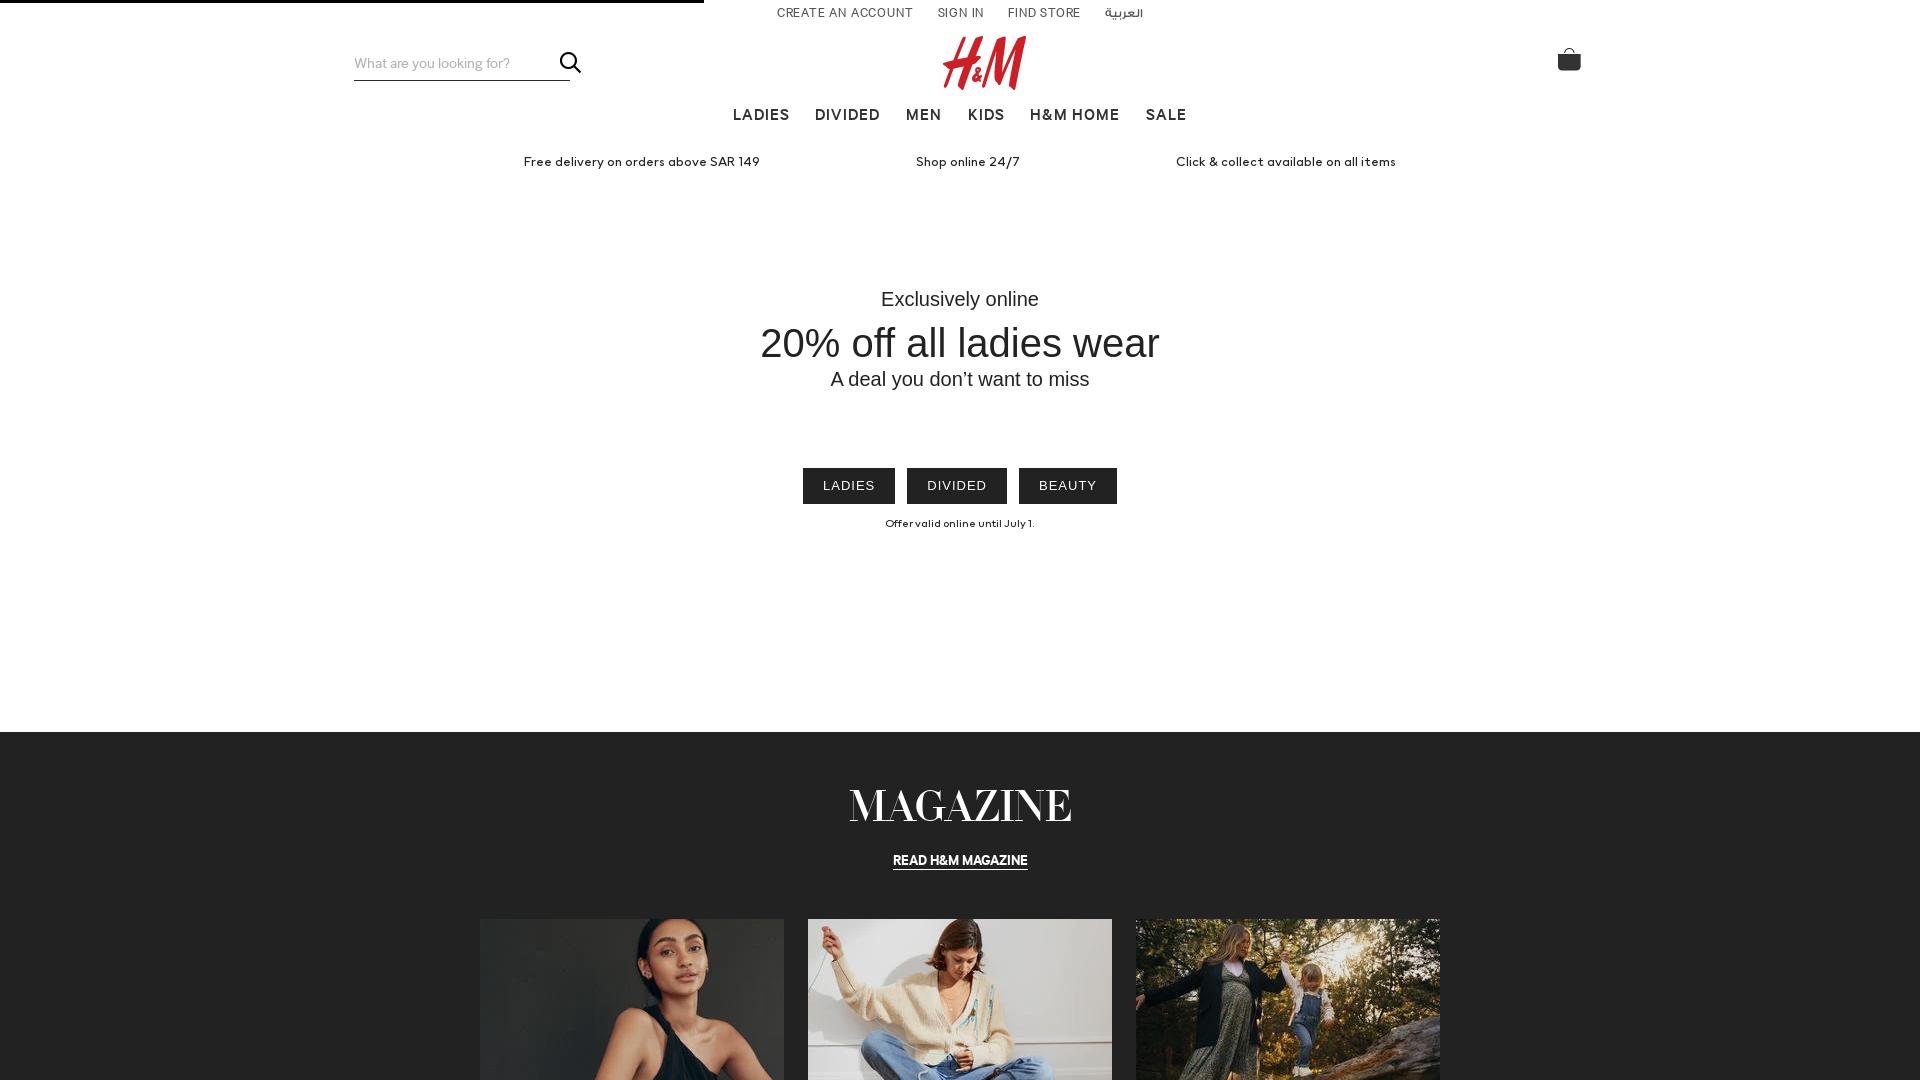 H&M (Hennes & Mauritz) / CPS website